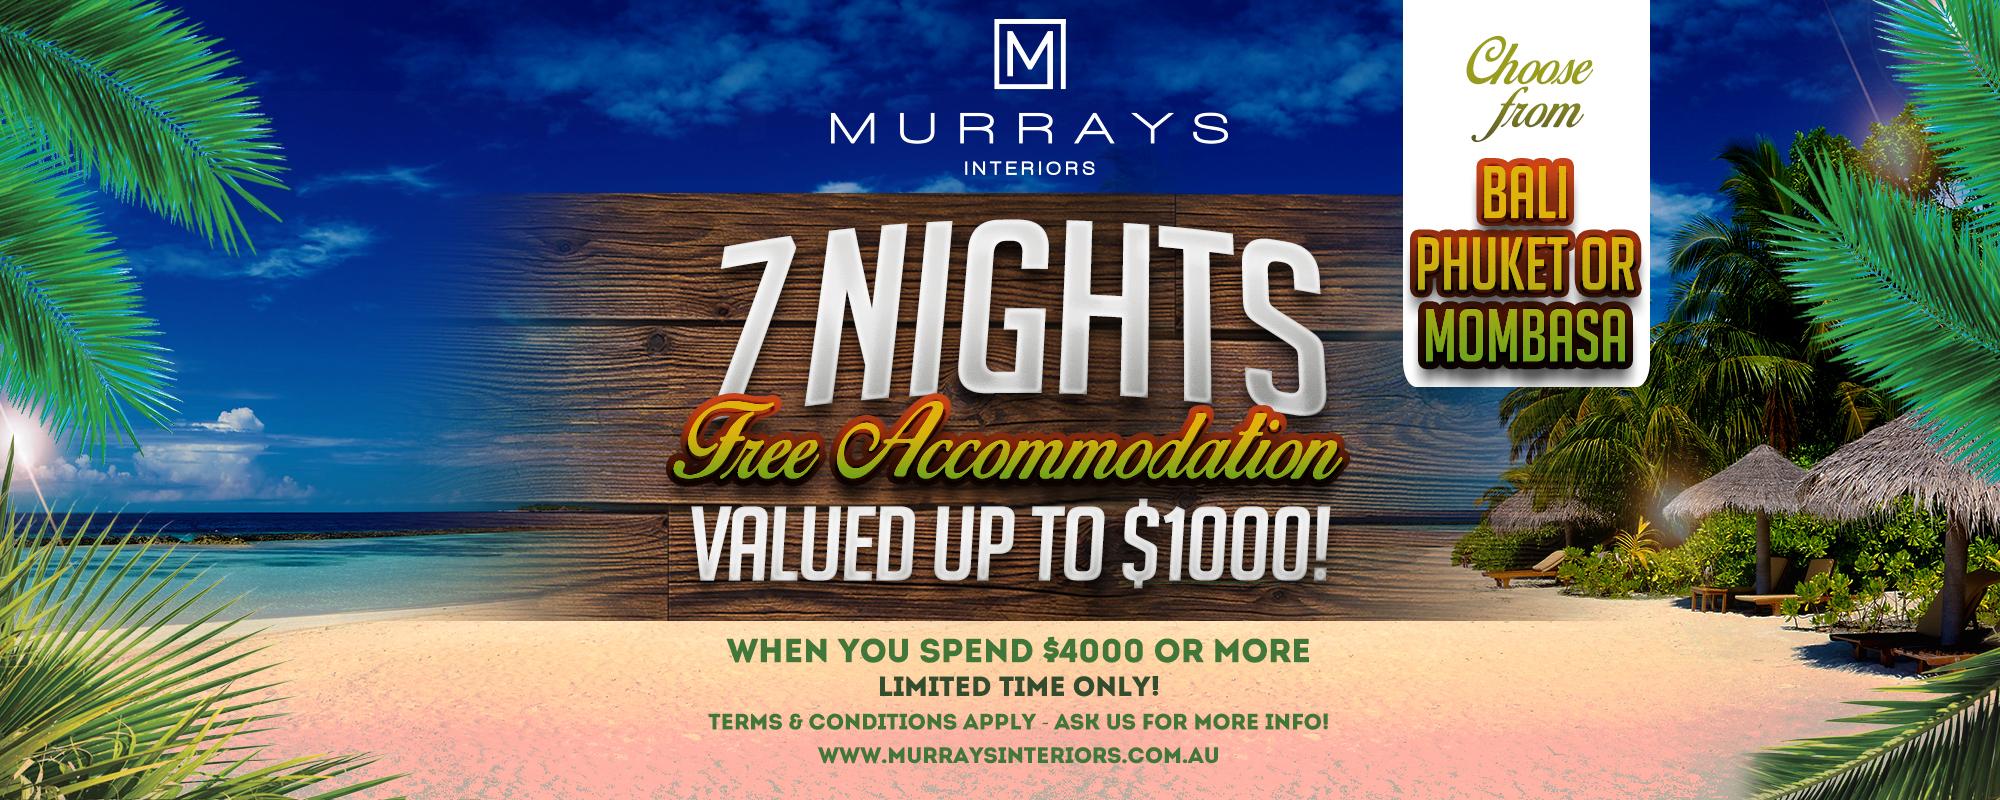 https://murraysinteriors.com.au/wp-content/uploads/2020/01/murrays-holiday-promo-web-banner-2000-x-800.jpg